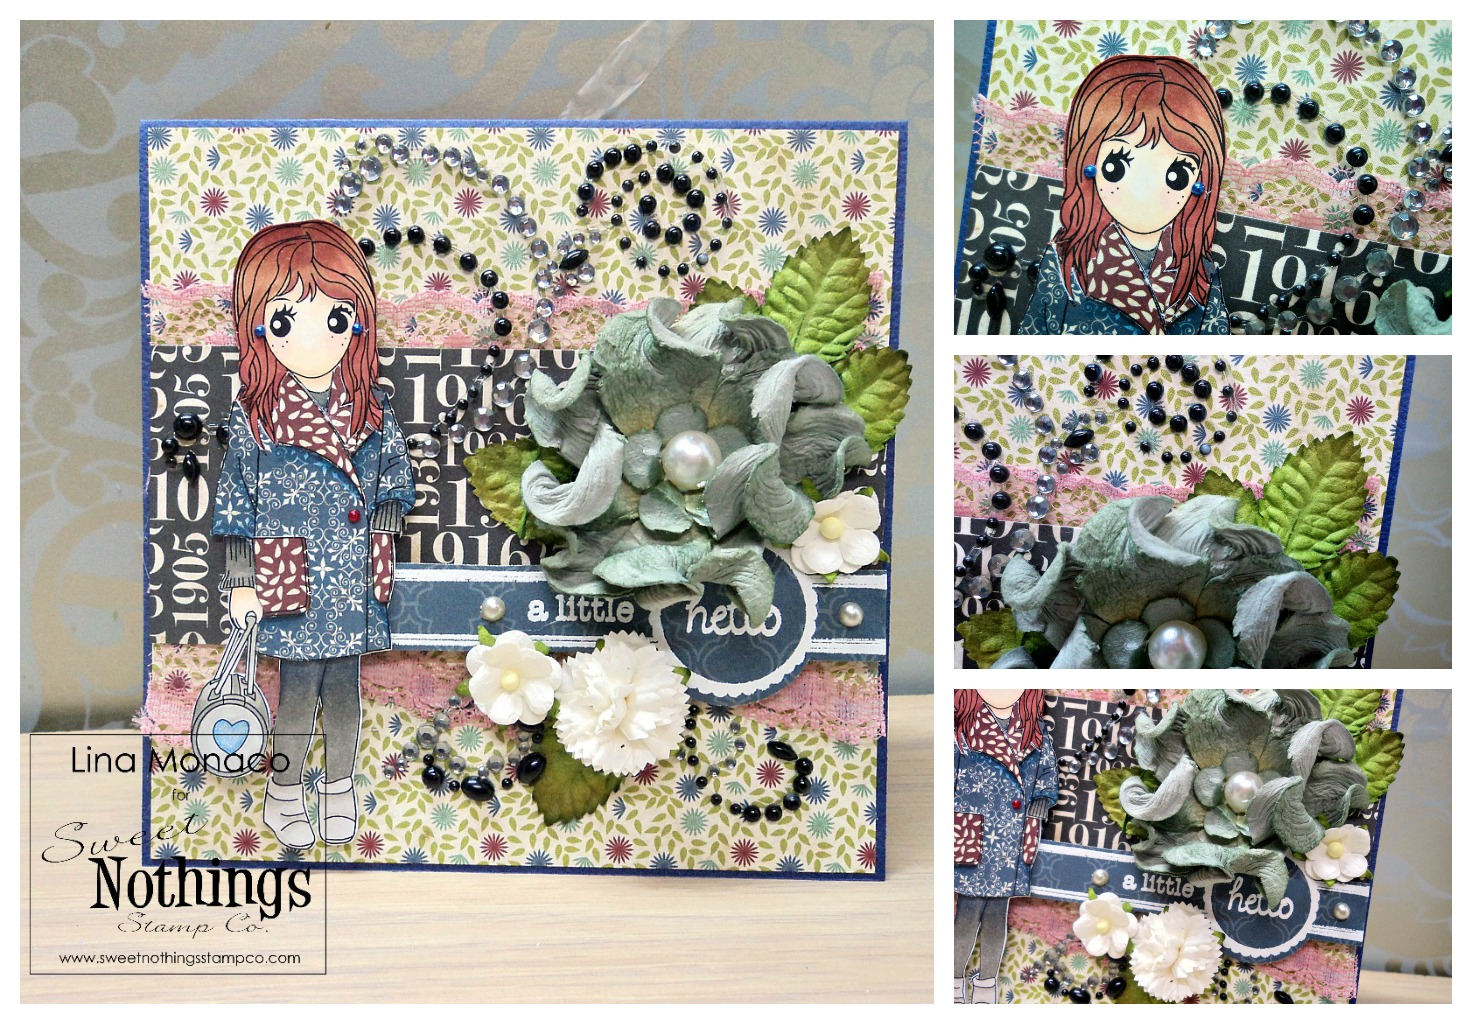 http://2.bp.blogspot.com/-kwM4xL9kqMY/UJrhNm2qGKI/AAAAAAAAA6s/d-WVI4Ej4t8/s1600/Uptown+Sophie+card.jpg